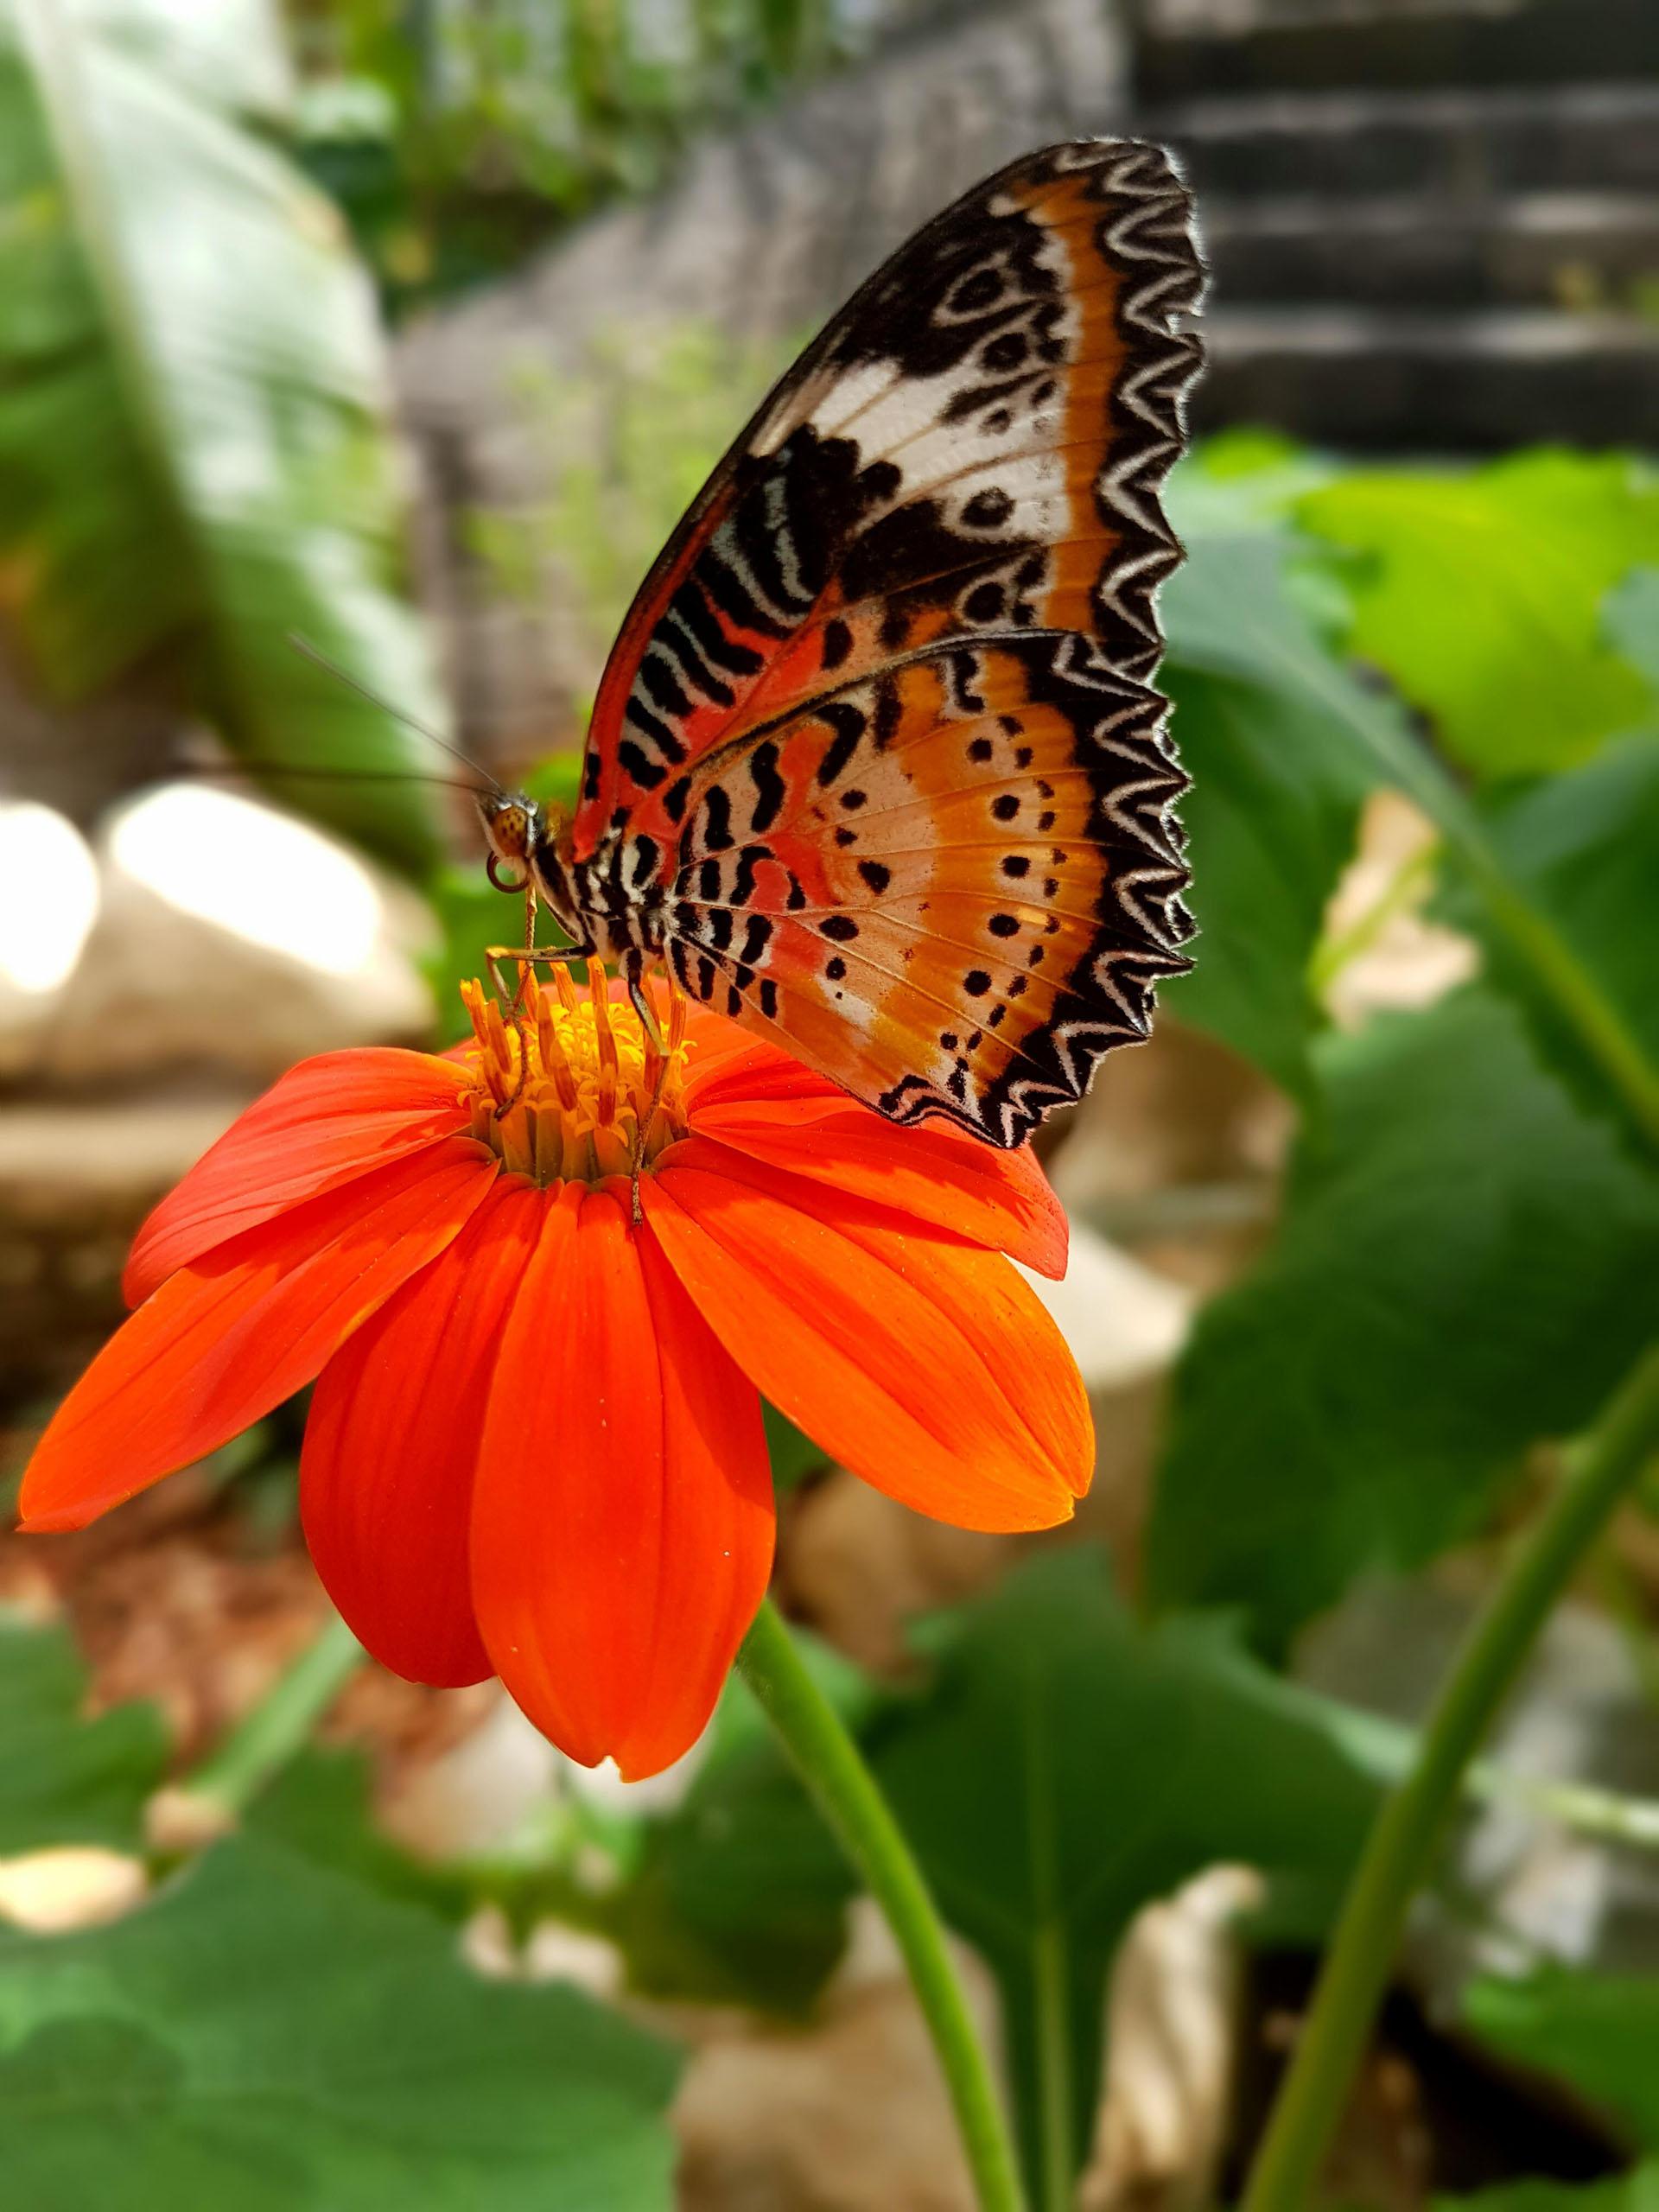 Enjoy a spooky half term at Stratford Butterfly Farm!